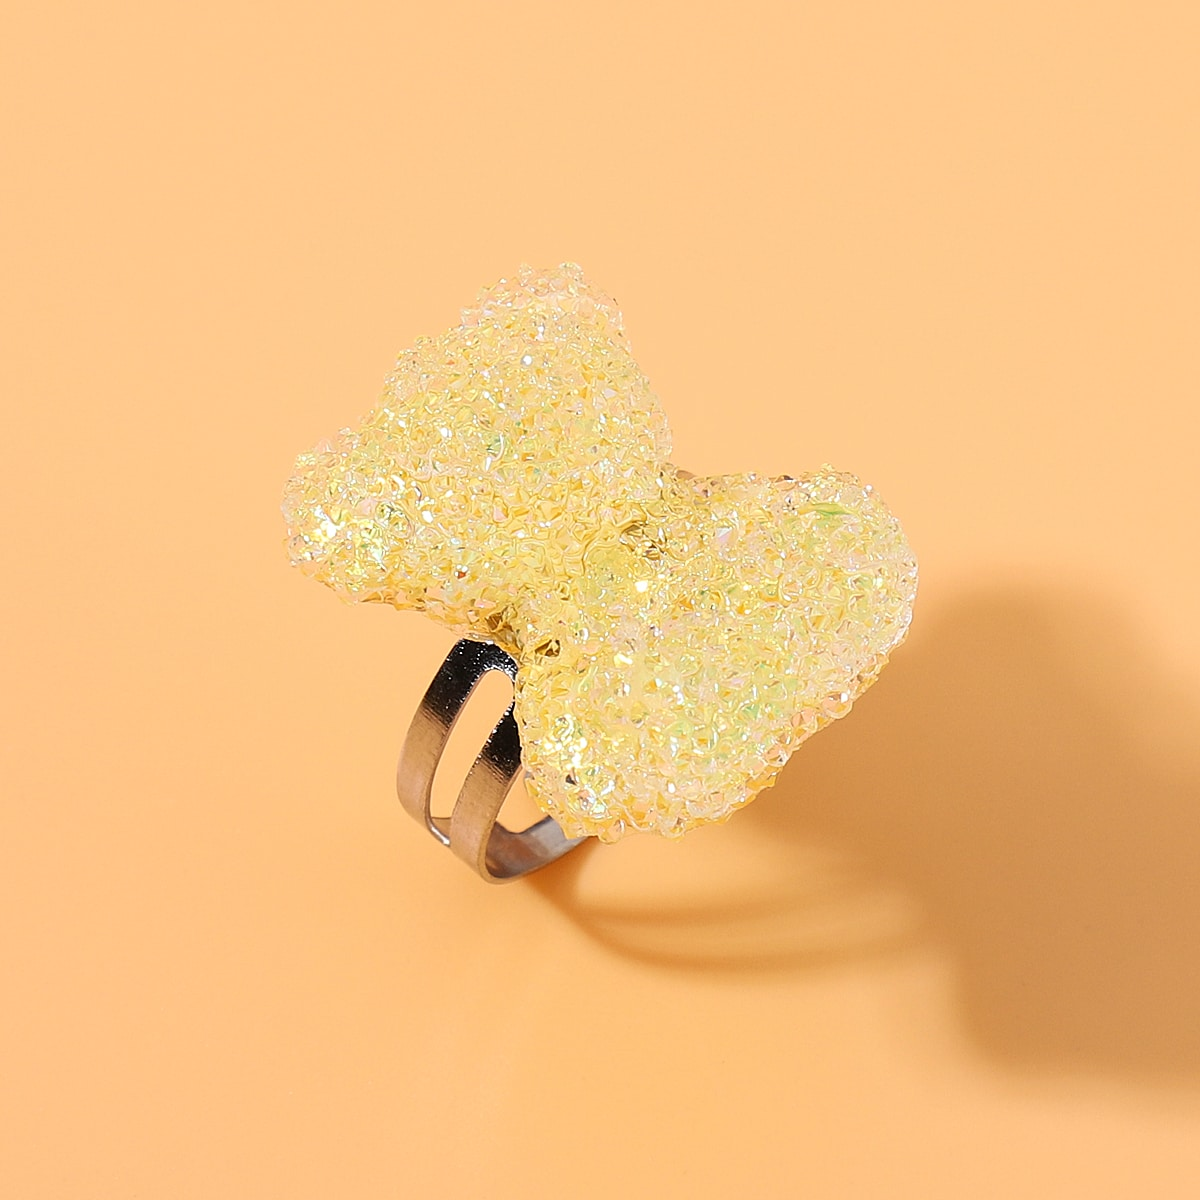 Кольцо с декором акрилового медведя фото